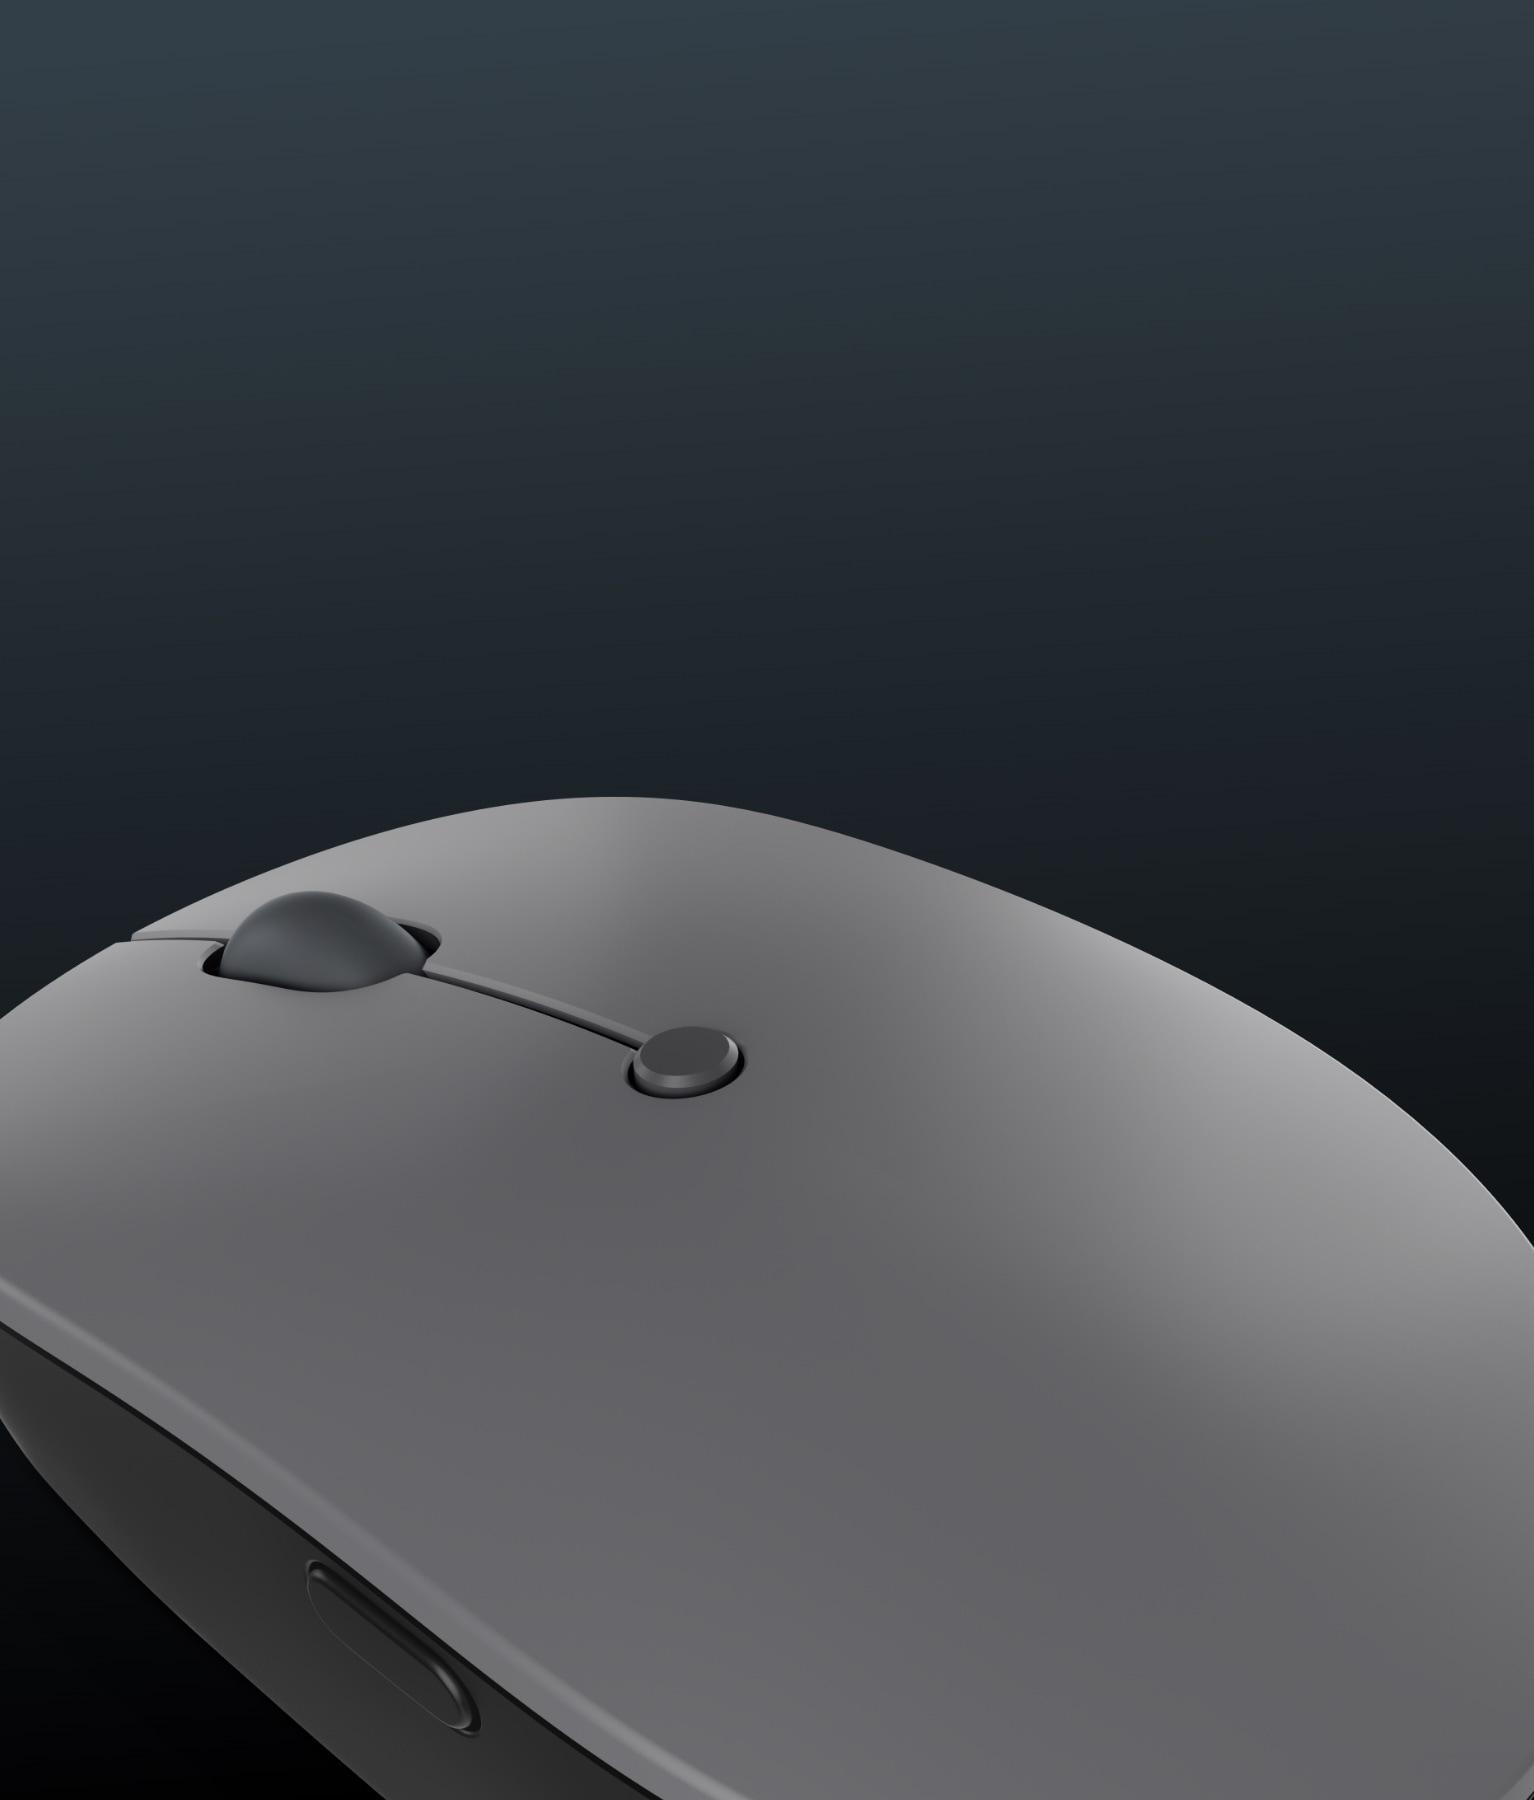 Souris sans fil USB-C Lenovo Go